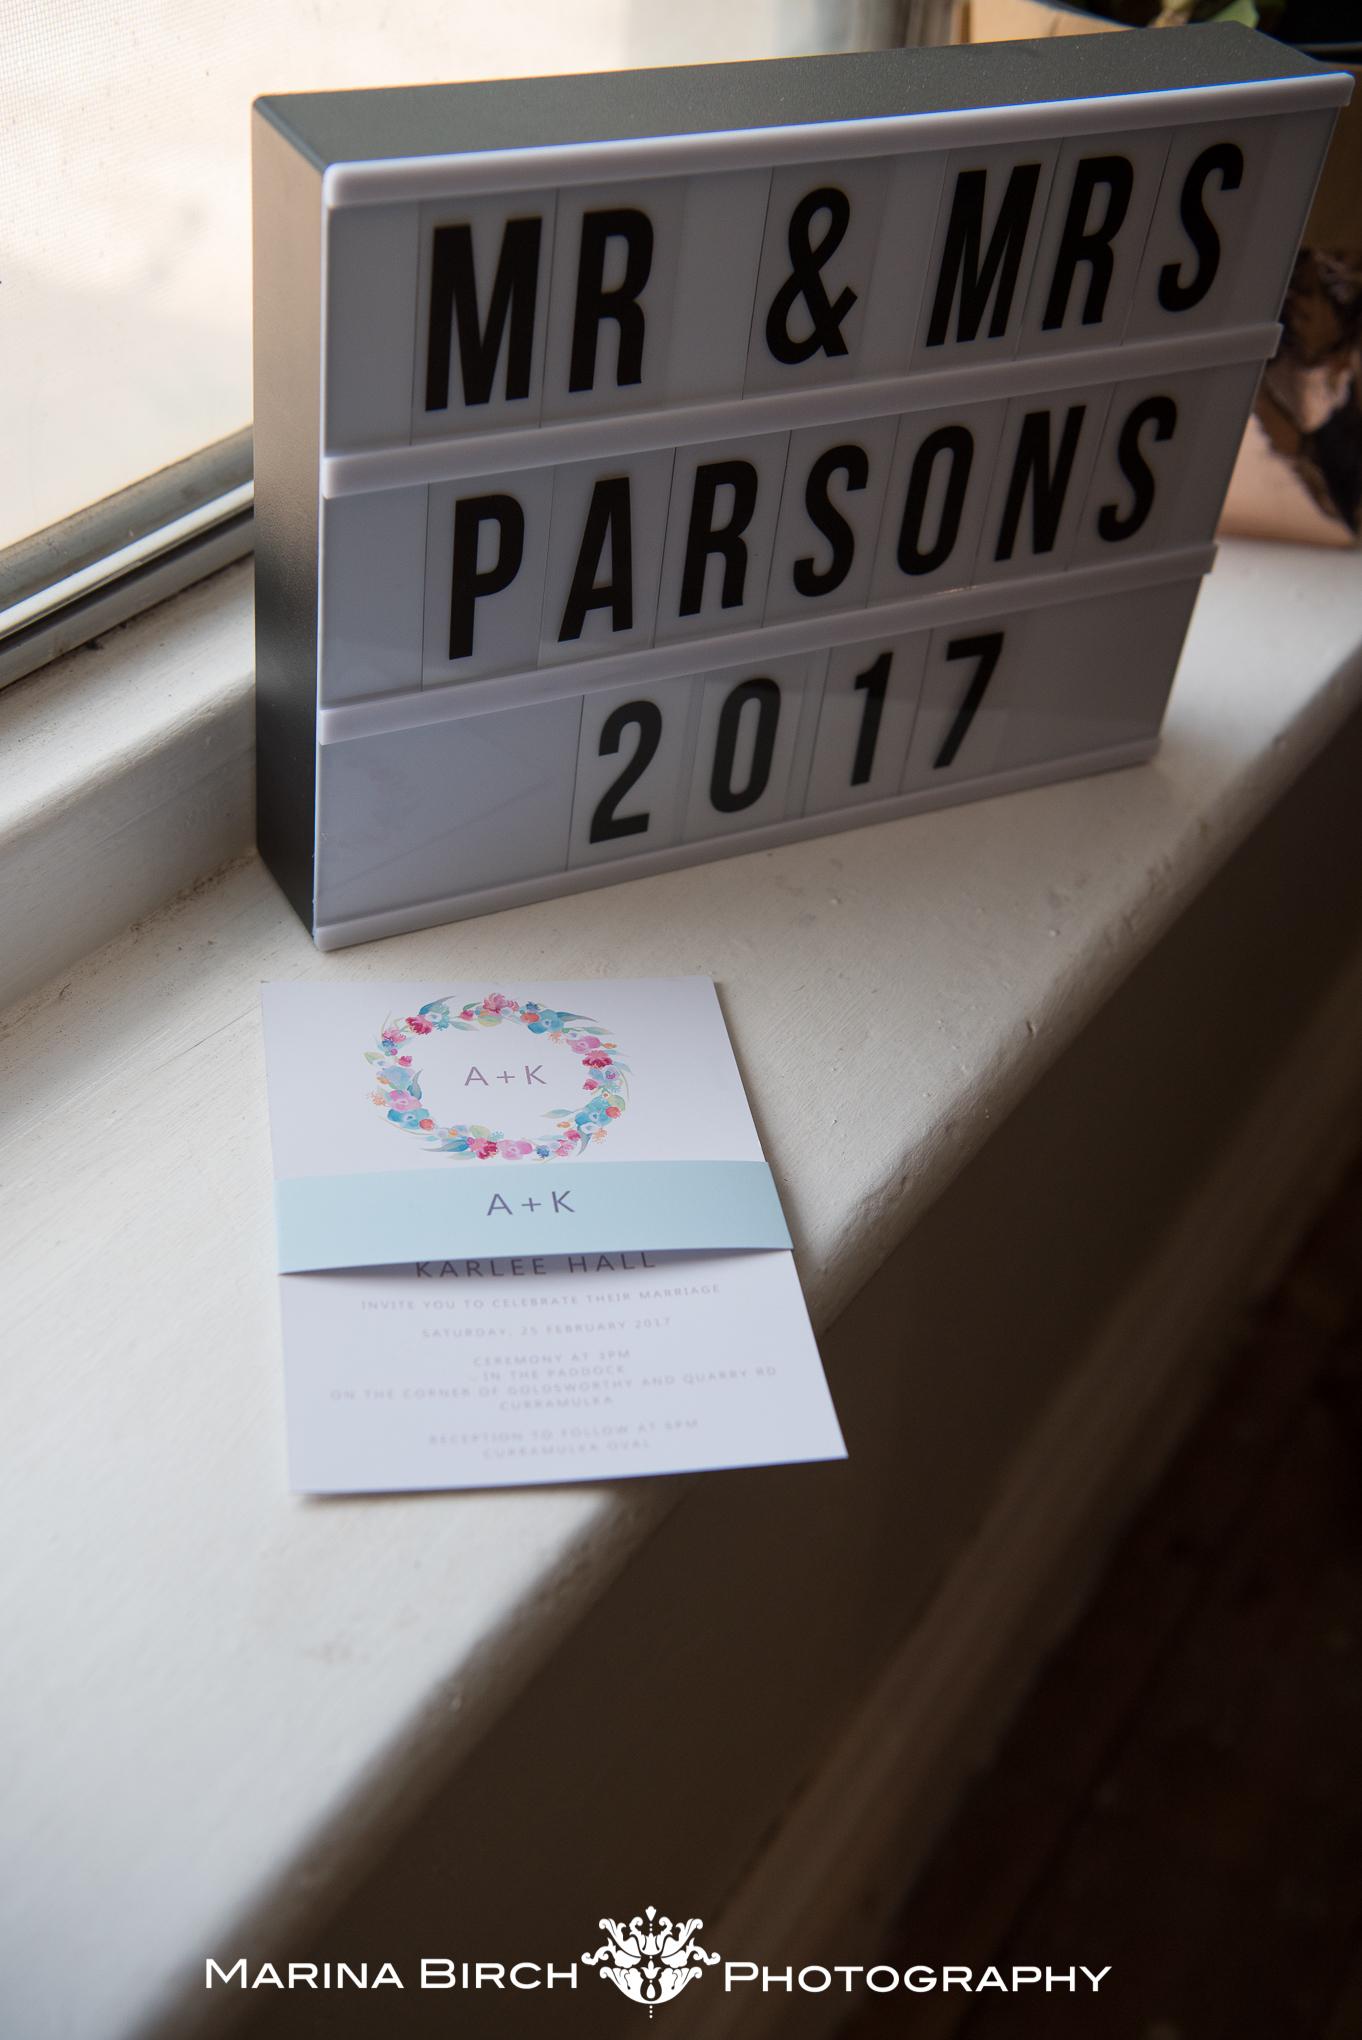 MBP.Parson's wedding-2.jpg